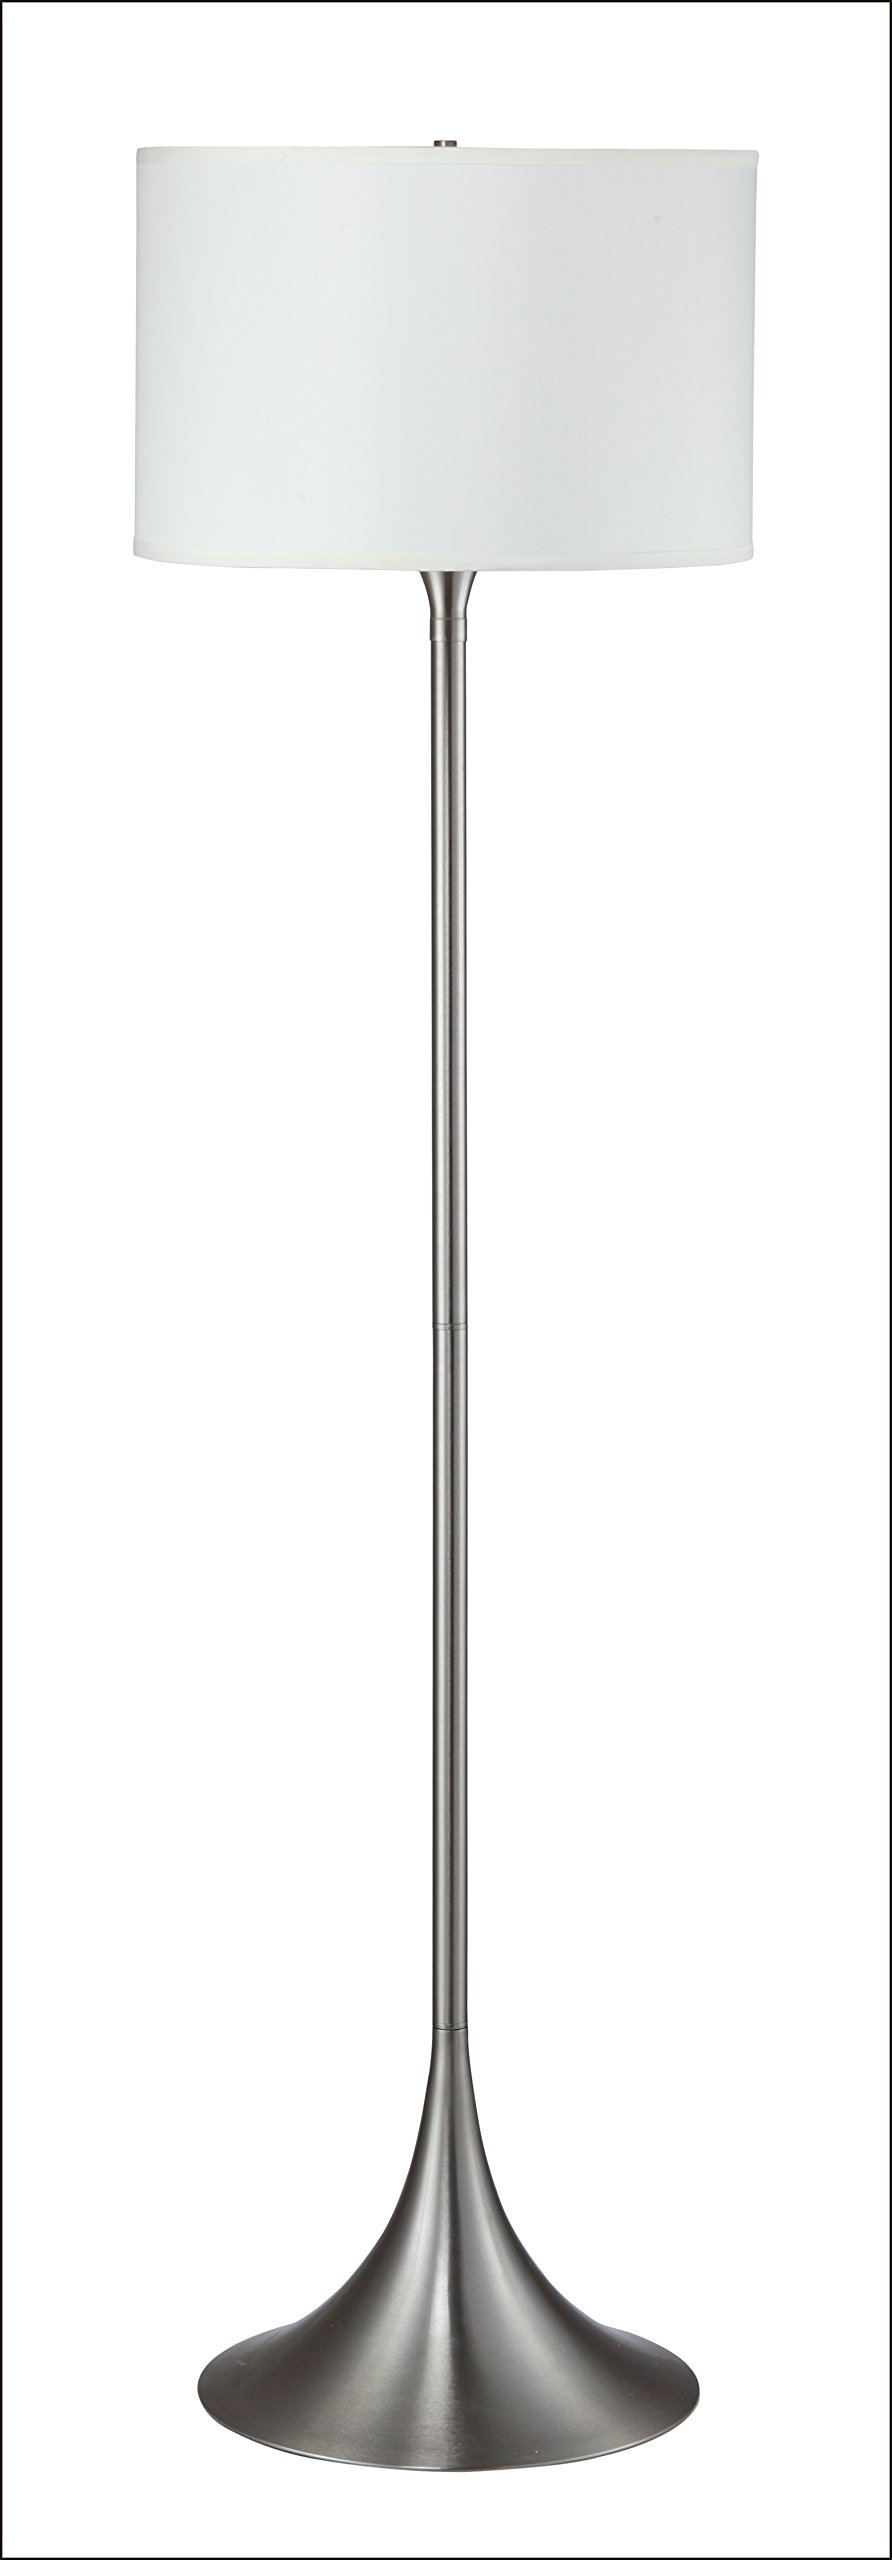 Major-Q 6272 Brushed Steel 62''H Floor Lamp, Remote Control Outlet, Large, Silver by Major-Q (Image #1)